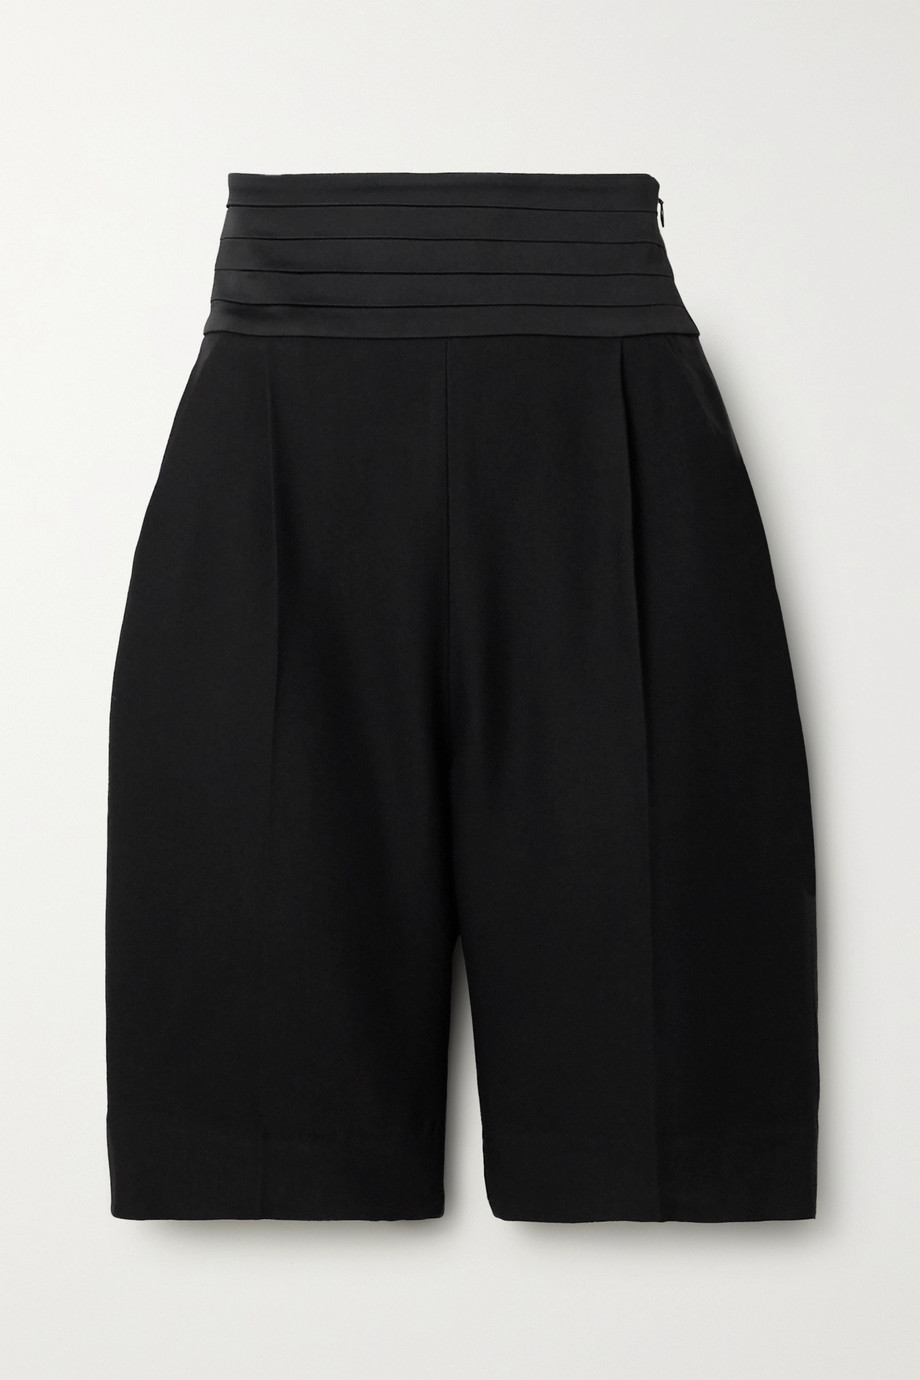 Khaite Birdie pleated satin and twill shorts